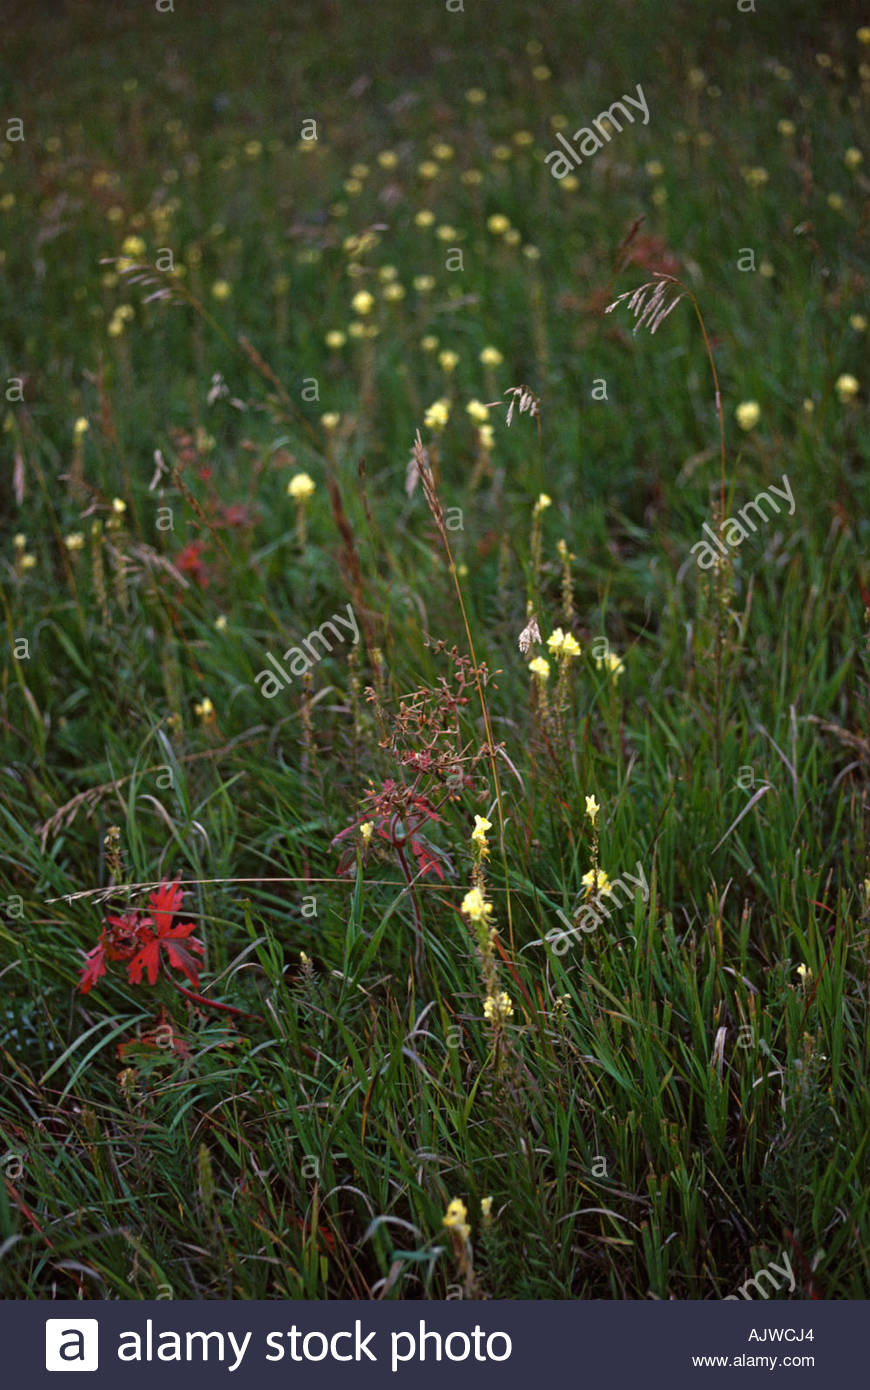 Northern mixed grassland prairie with wildflowers, Alberta Canada - Stock Image